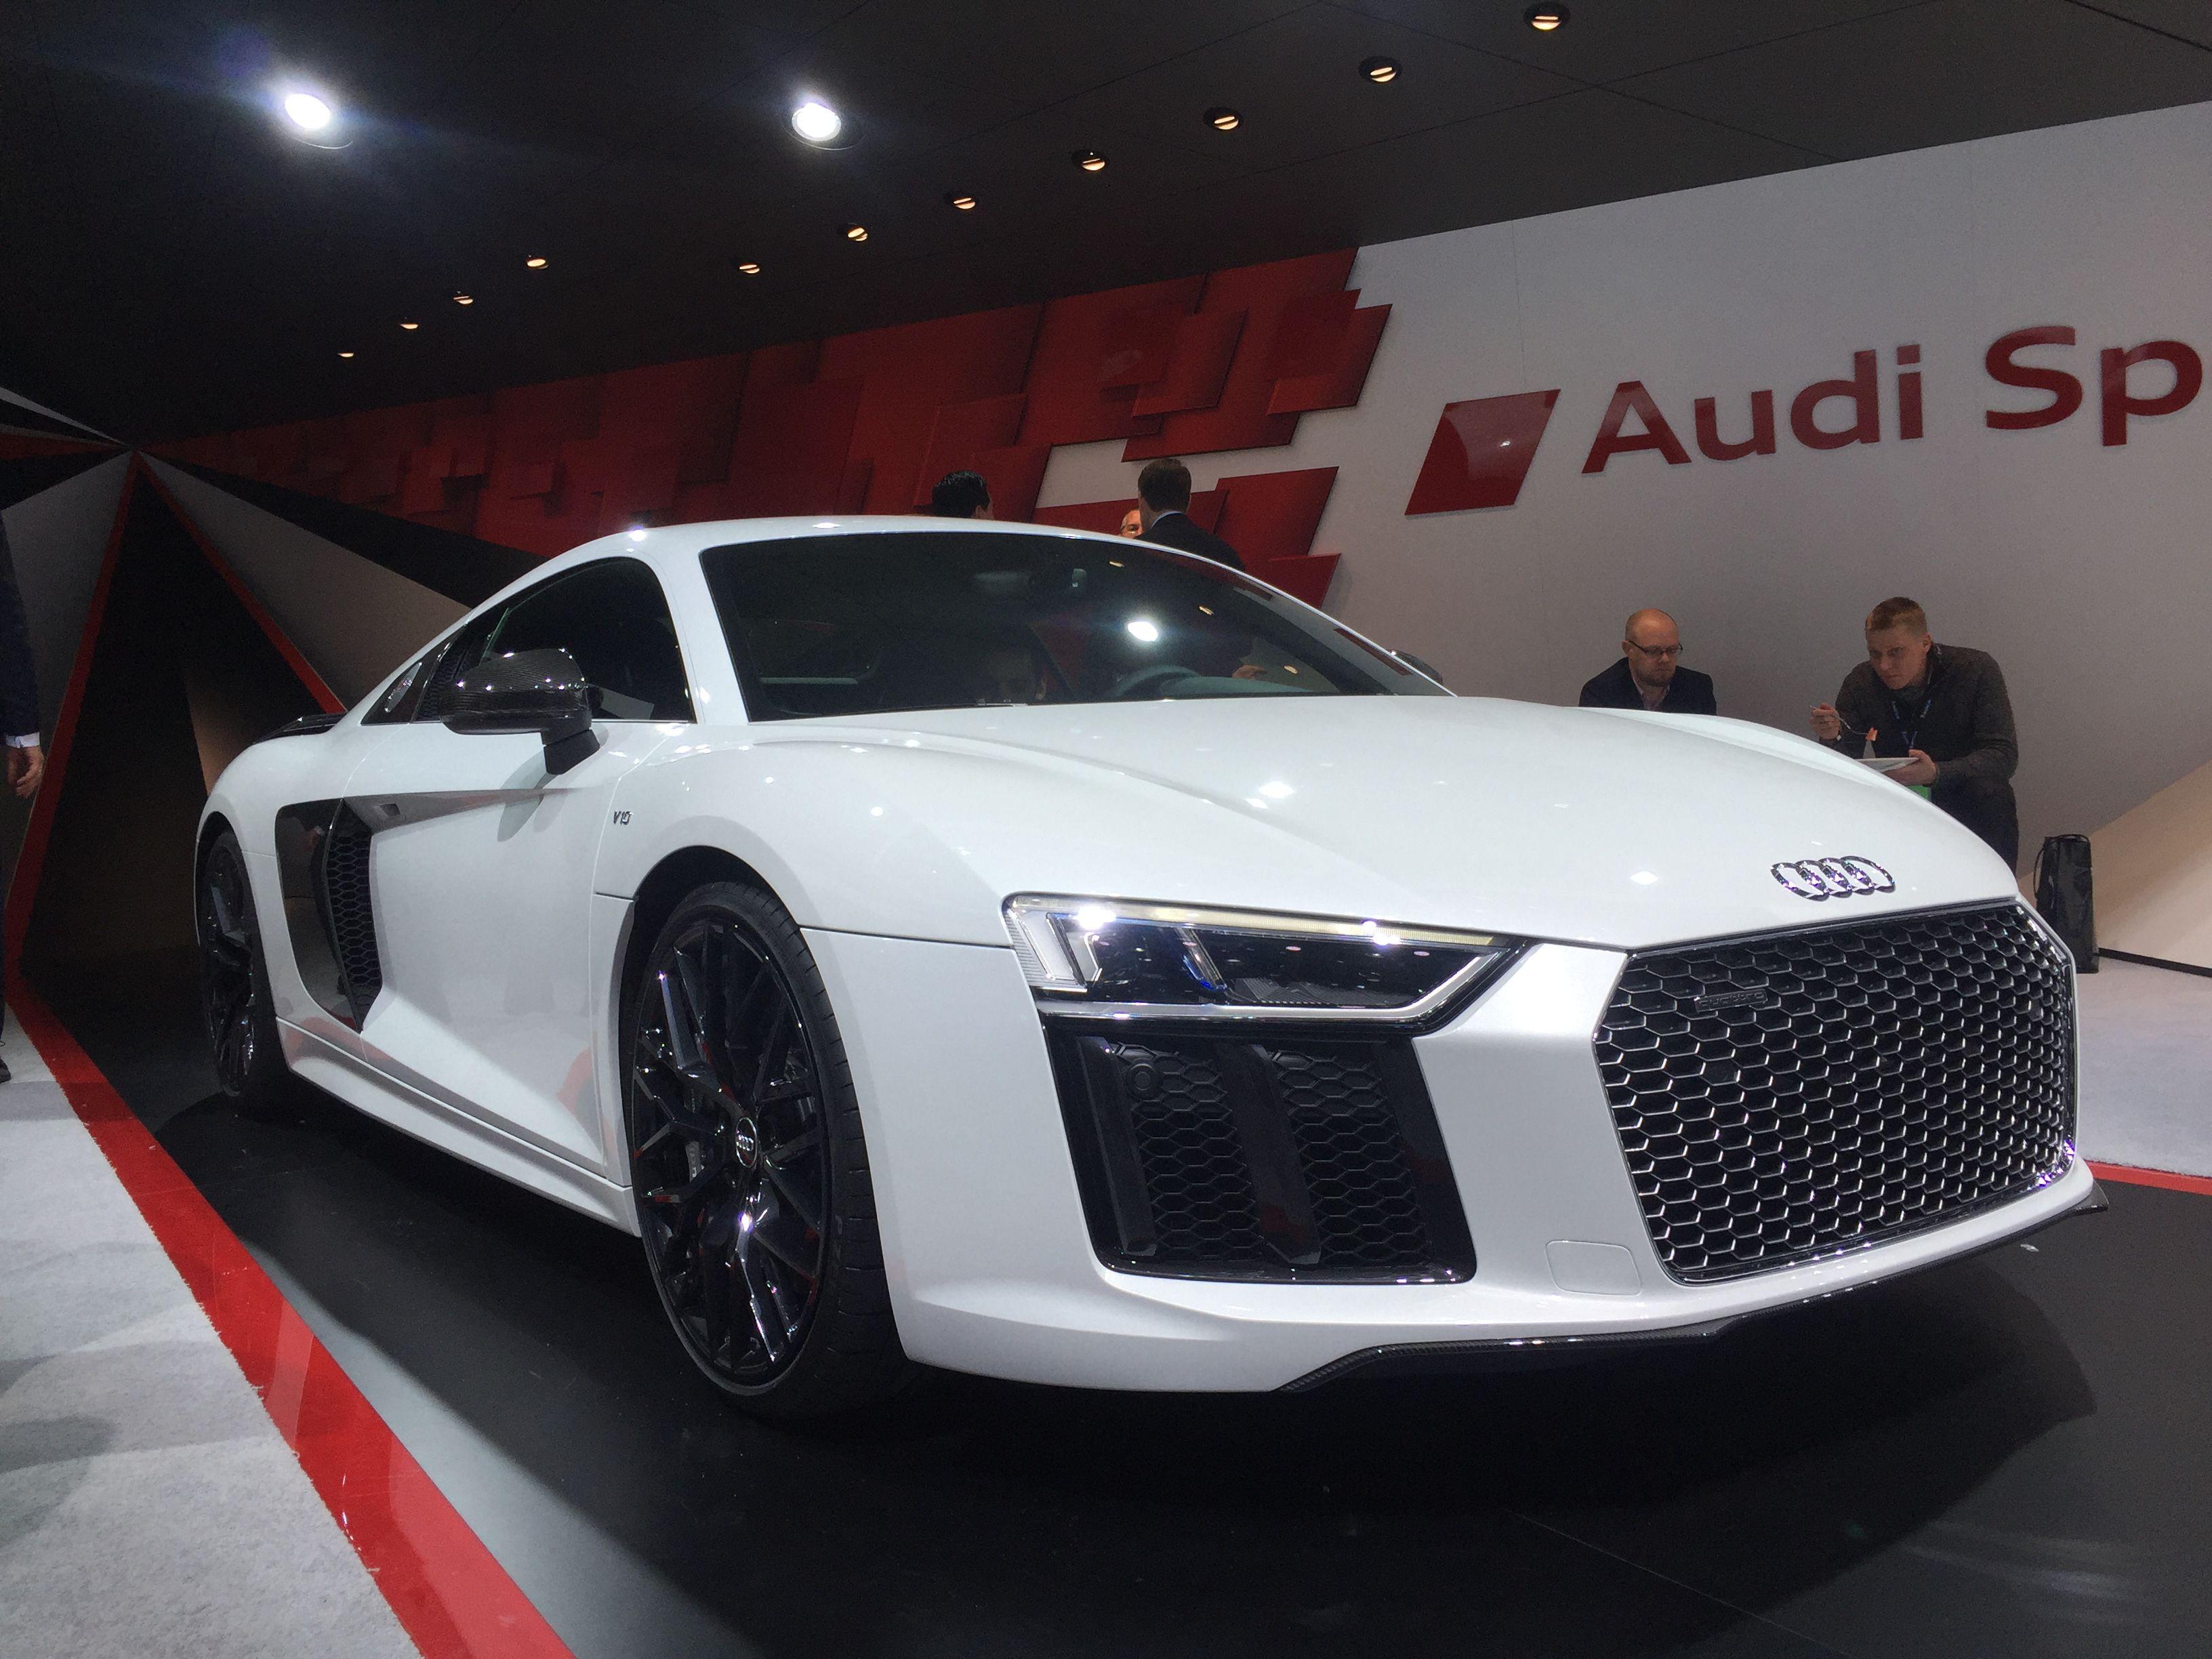 2019 audi r8 v10 plus edition hd car pinterest audi r8 audi and audi r8 v10